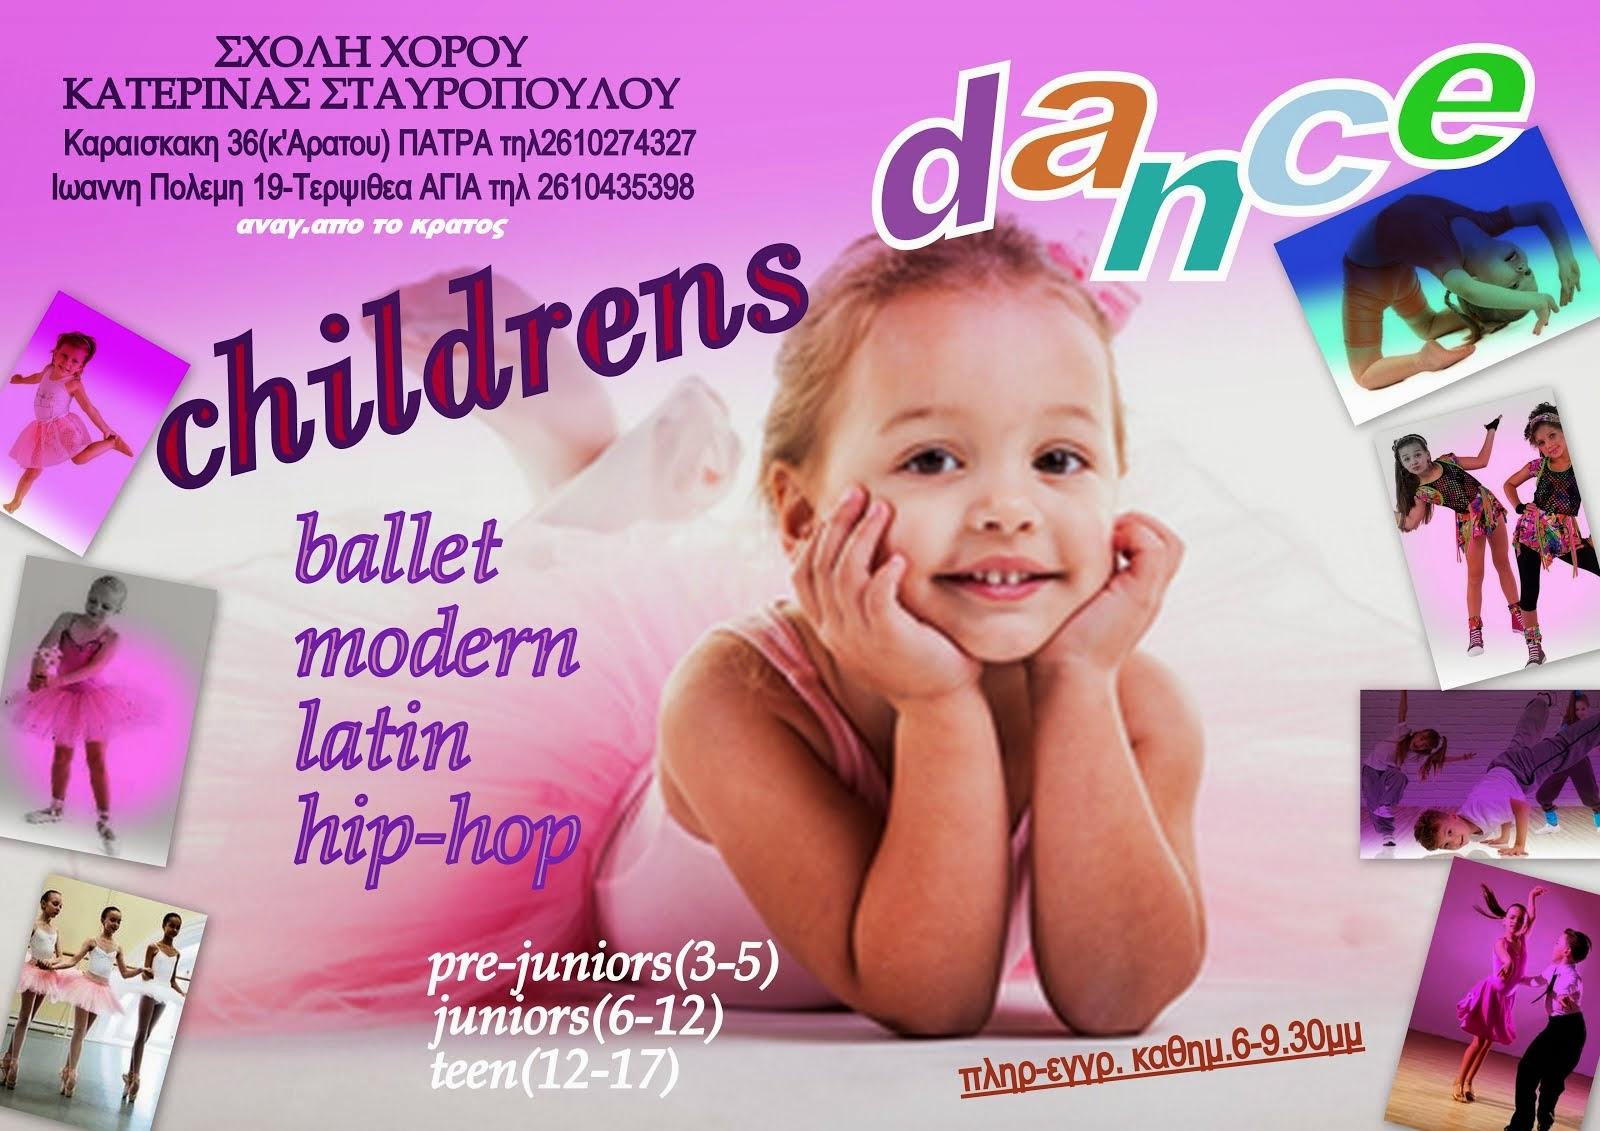 CHILDRENS DANCE-ΣΧΟΛΗ ΧΟΡΟΥ ΣΤΑΥΡΟΠΟΥΛΟΥ